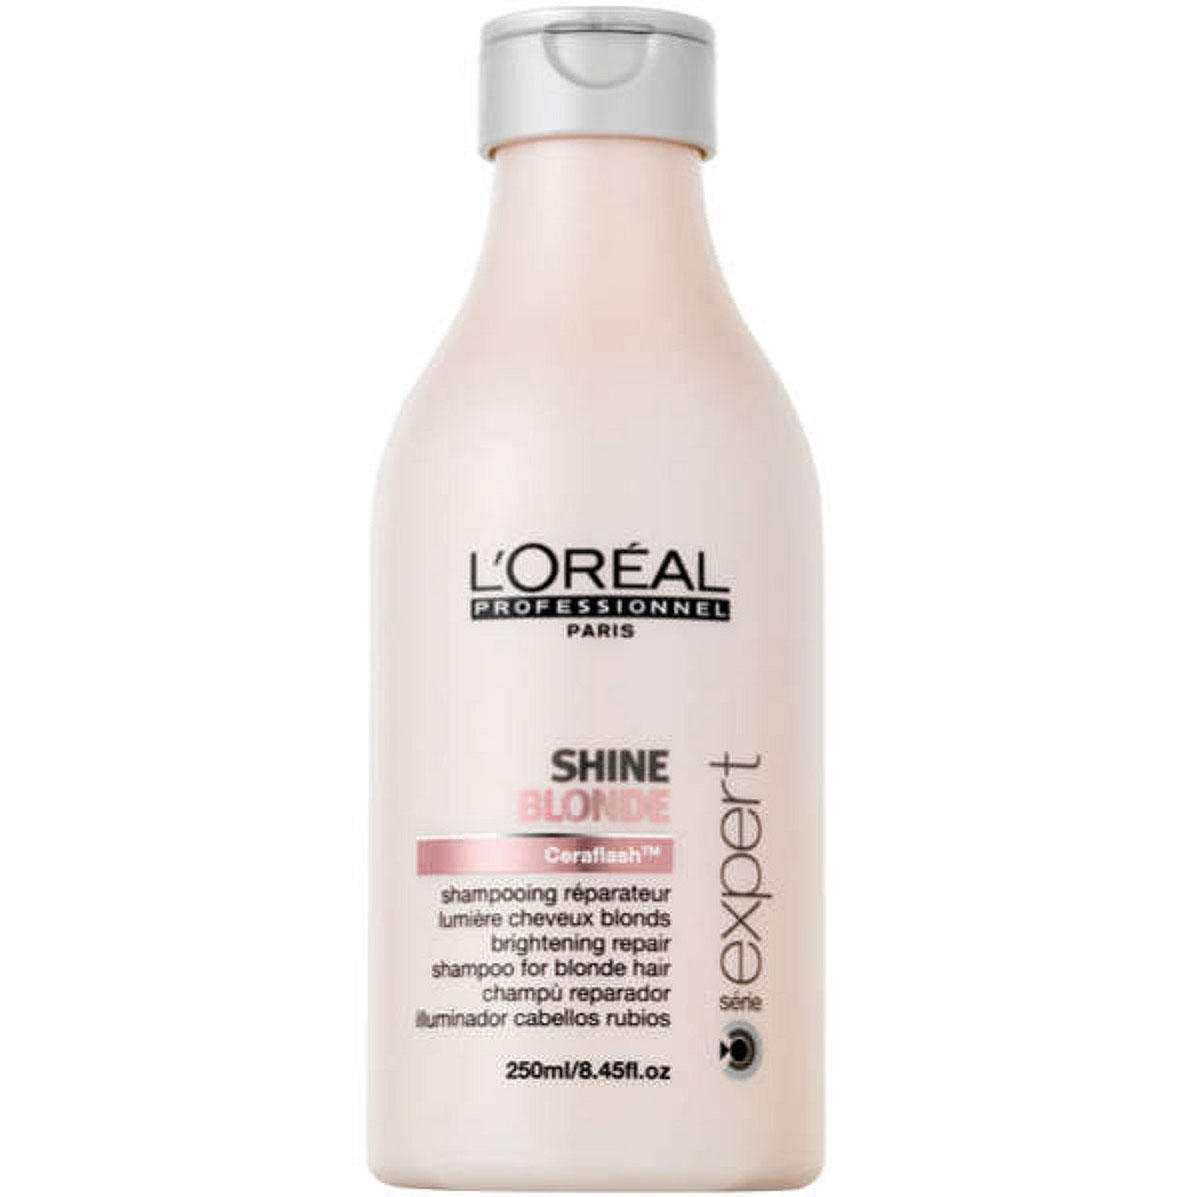 LOreal Professionnel Шампунь Expert Shine Blonde - 250 мл